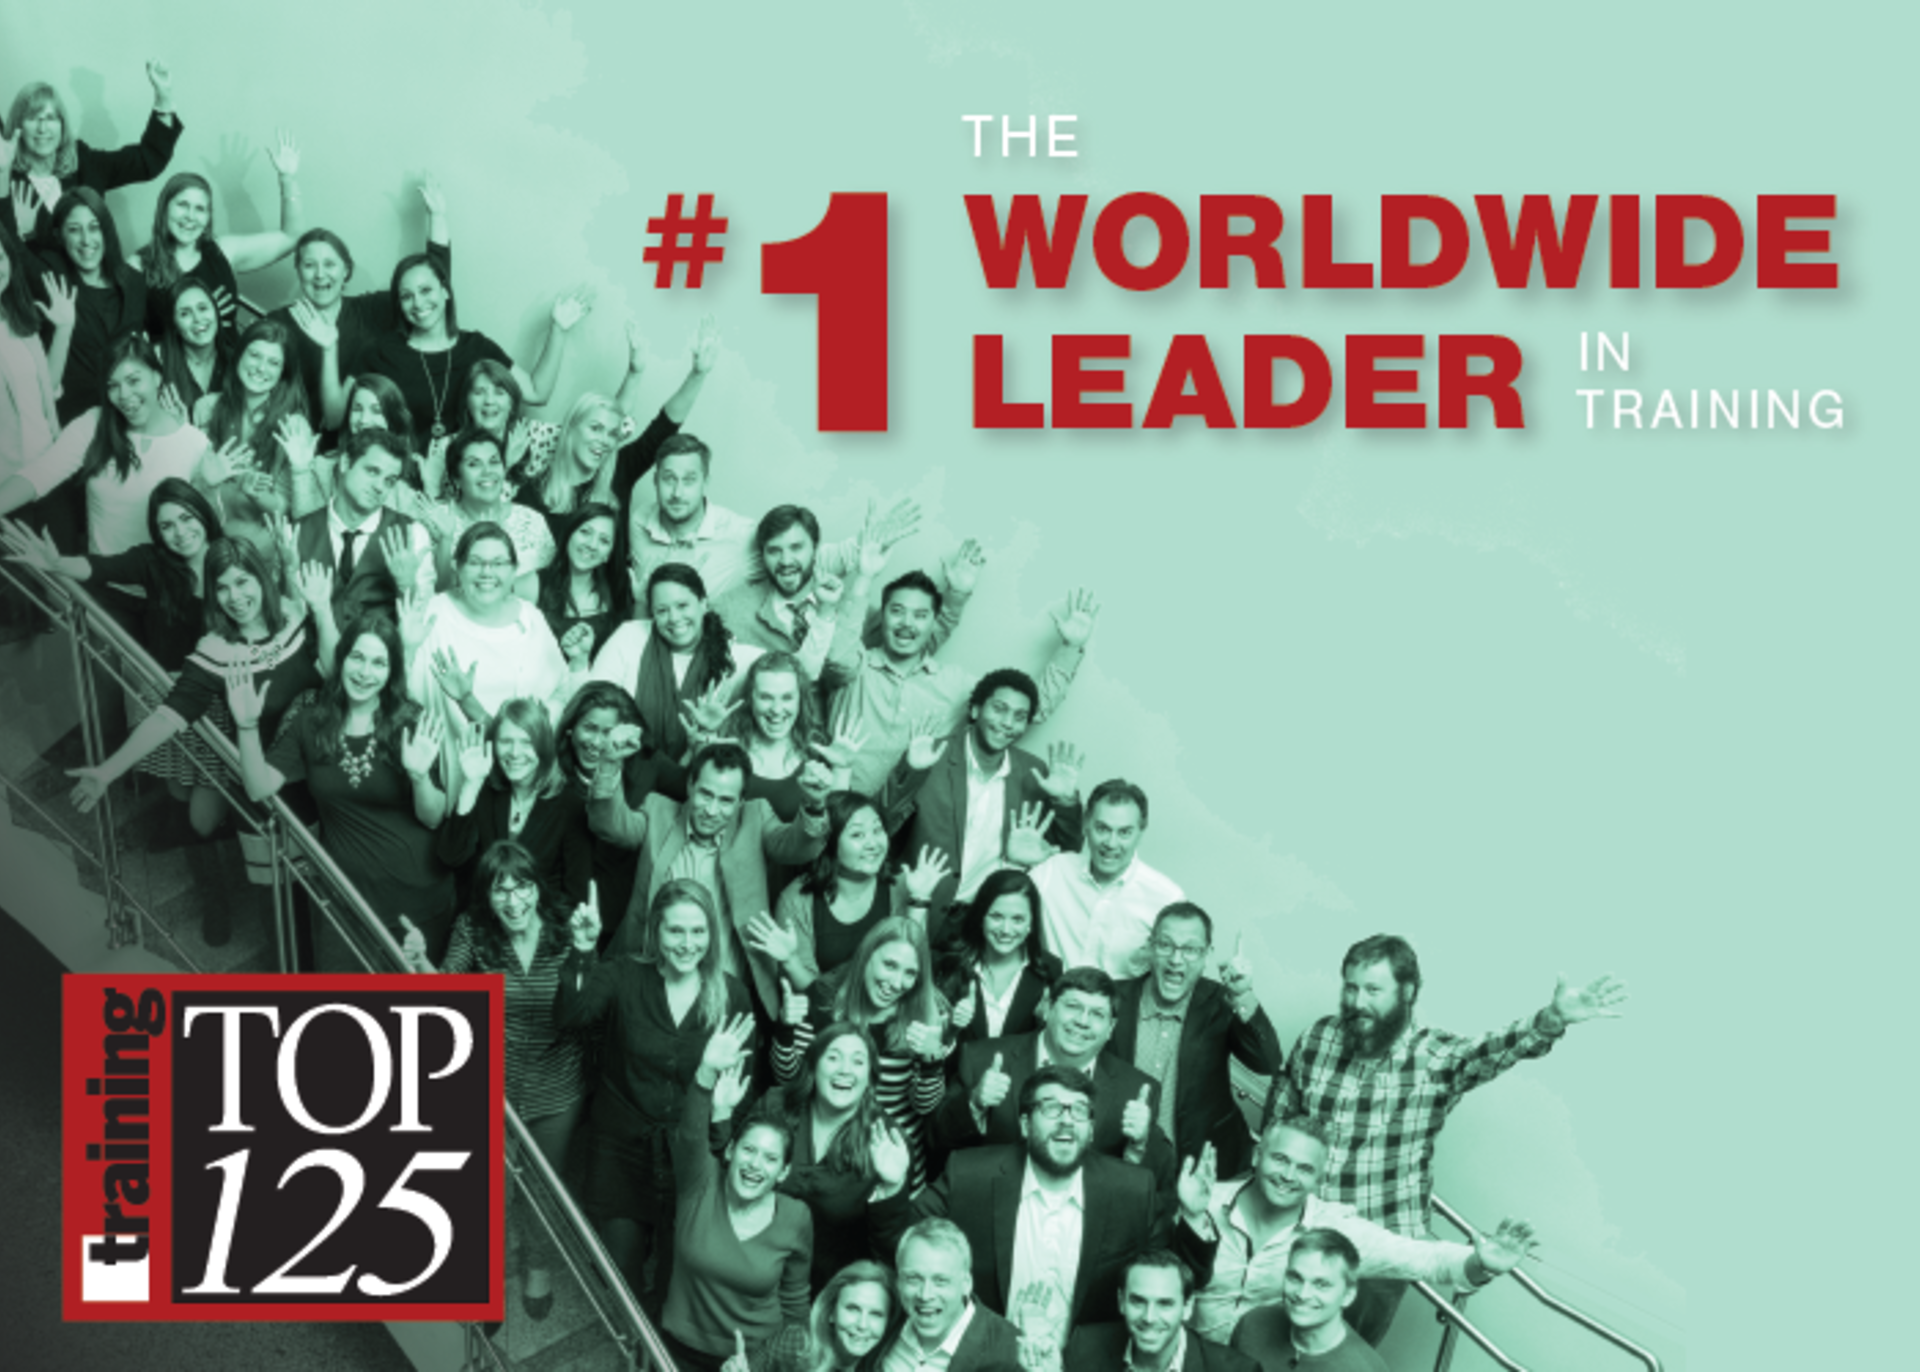 KELLER WILLIAMS NAMED TOP TRAINING ORGANIZATION WORLDWIDE